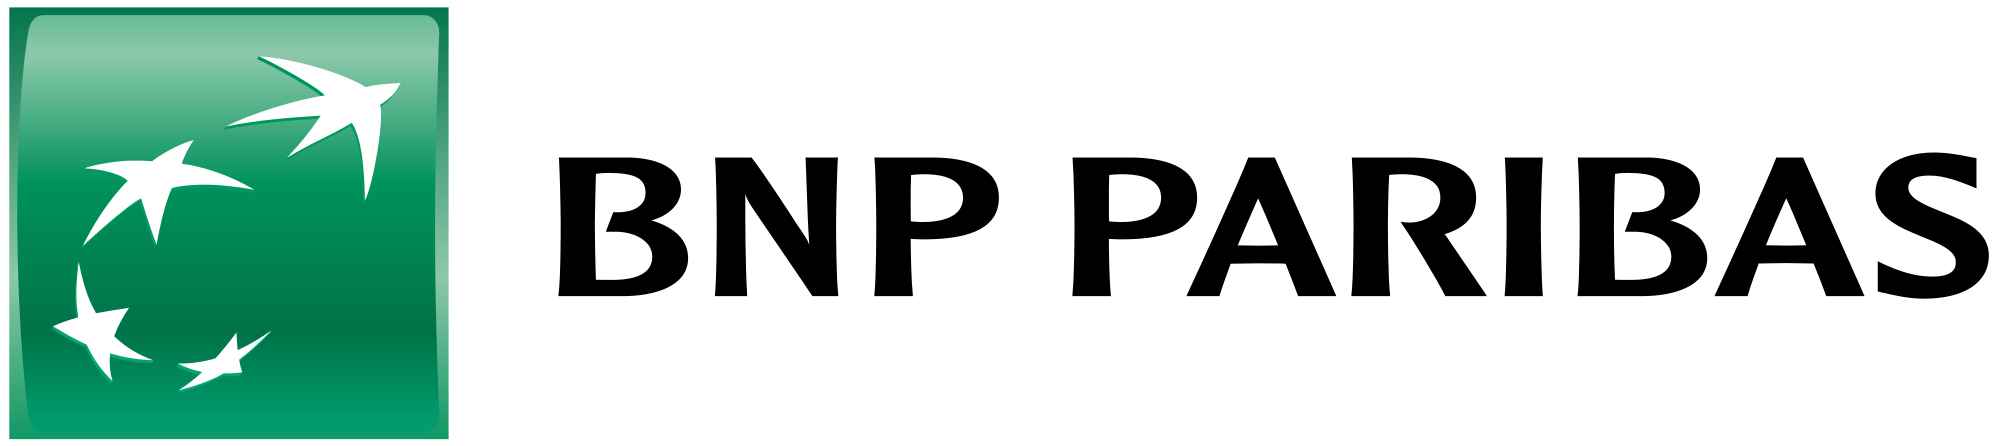 bnp-paribas-logo 1.png